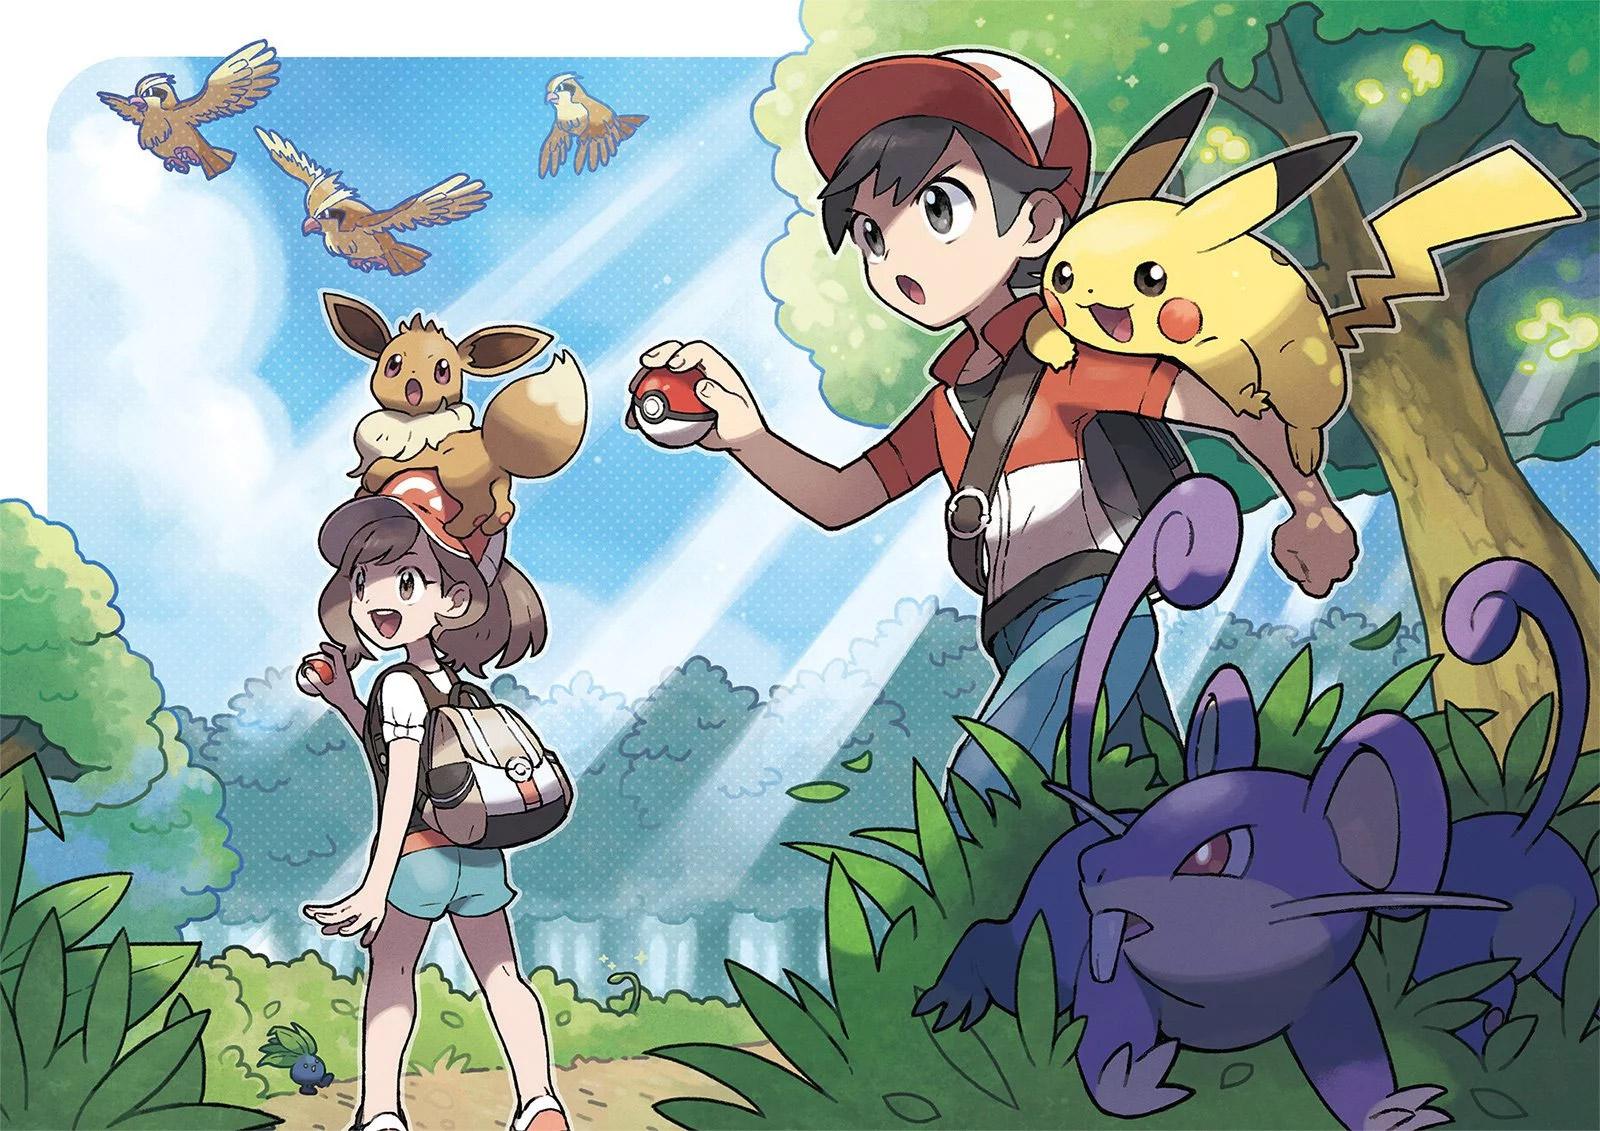 Game Freak isn't planning another Pokemon: Let's Go screenshot